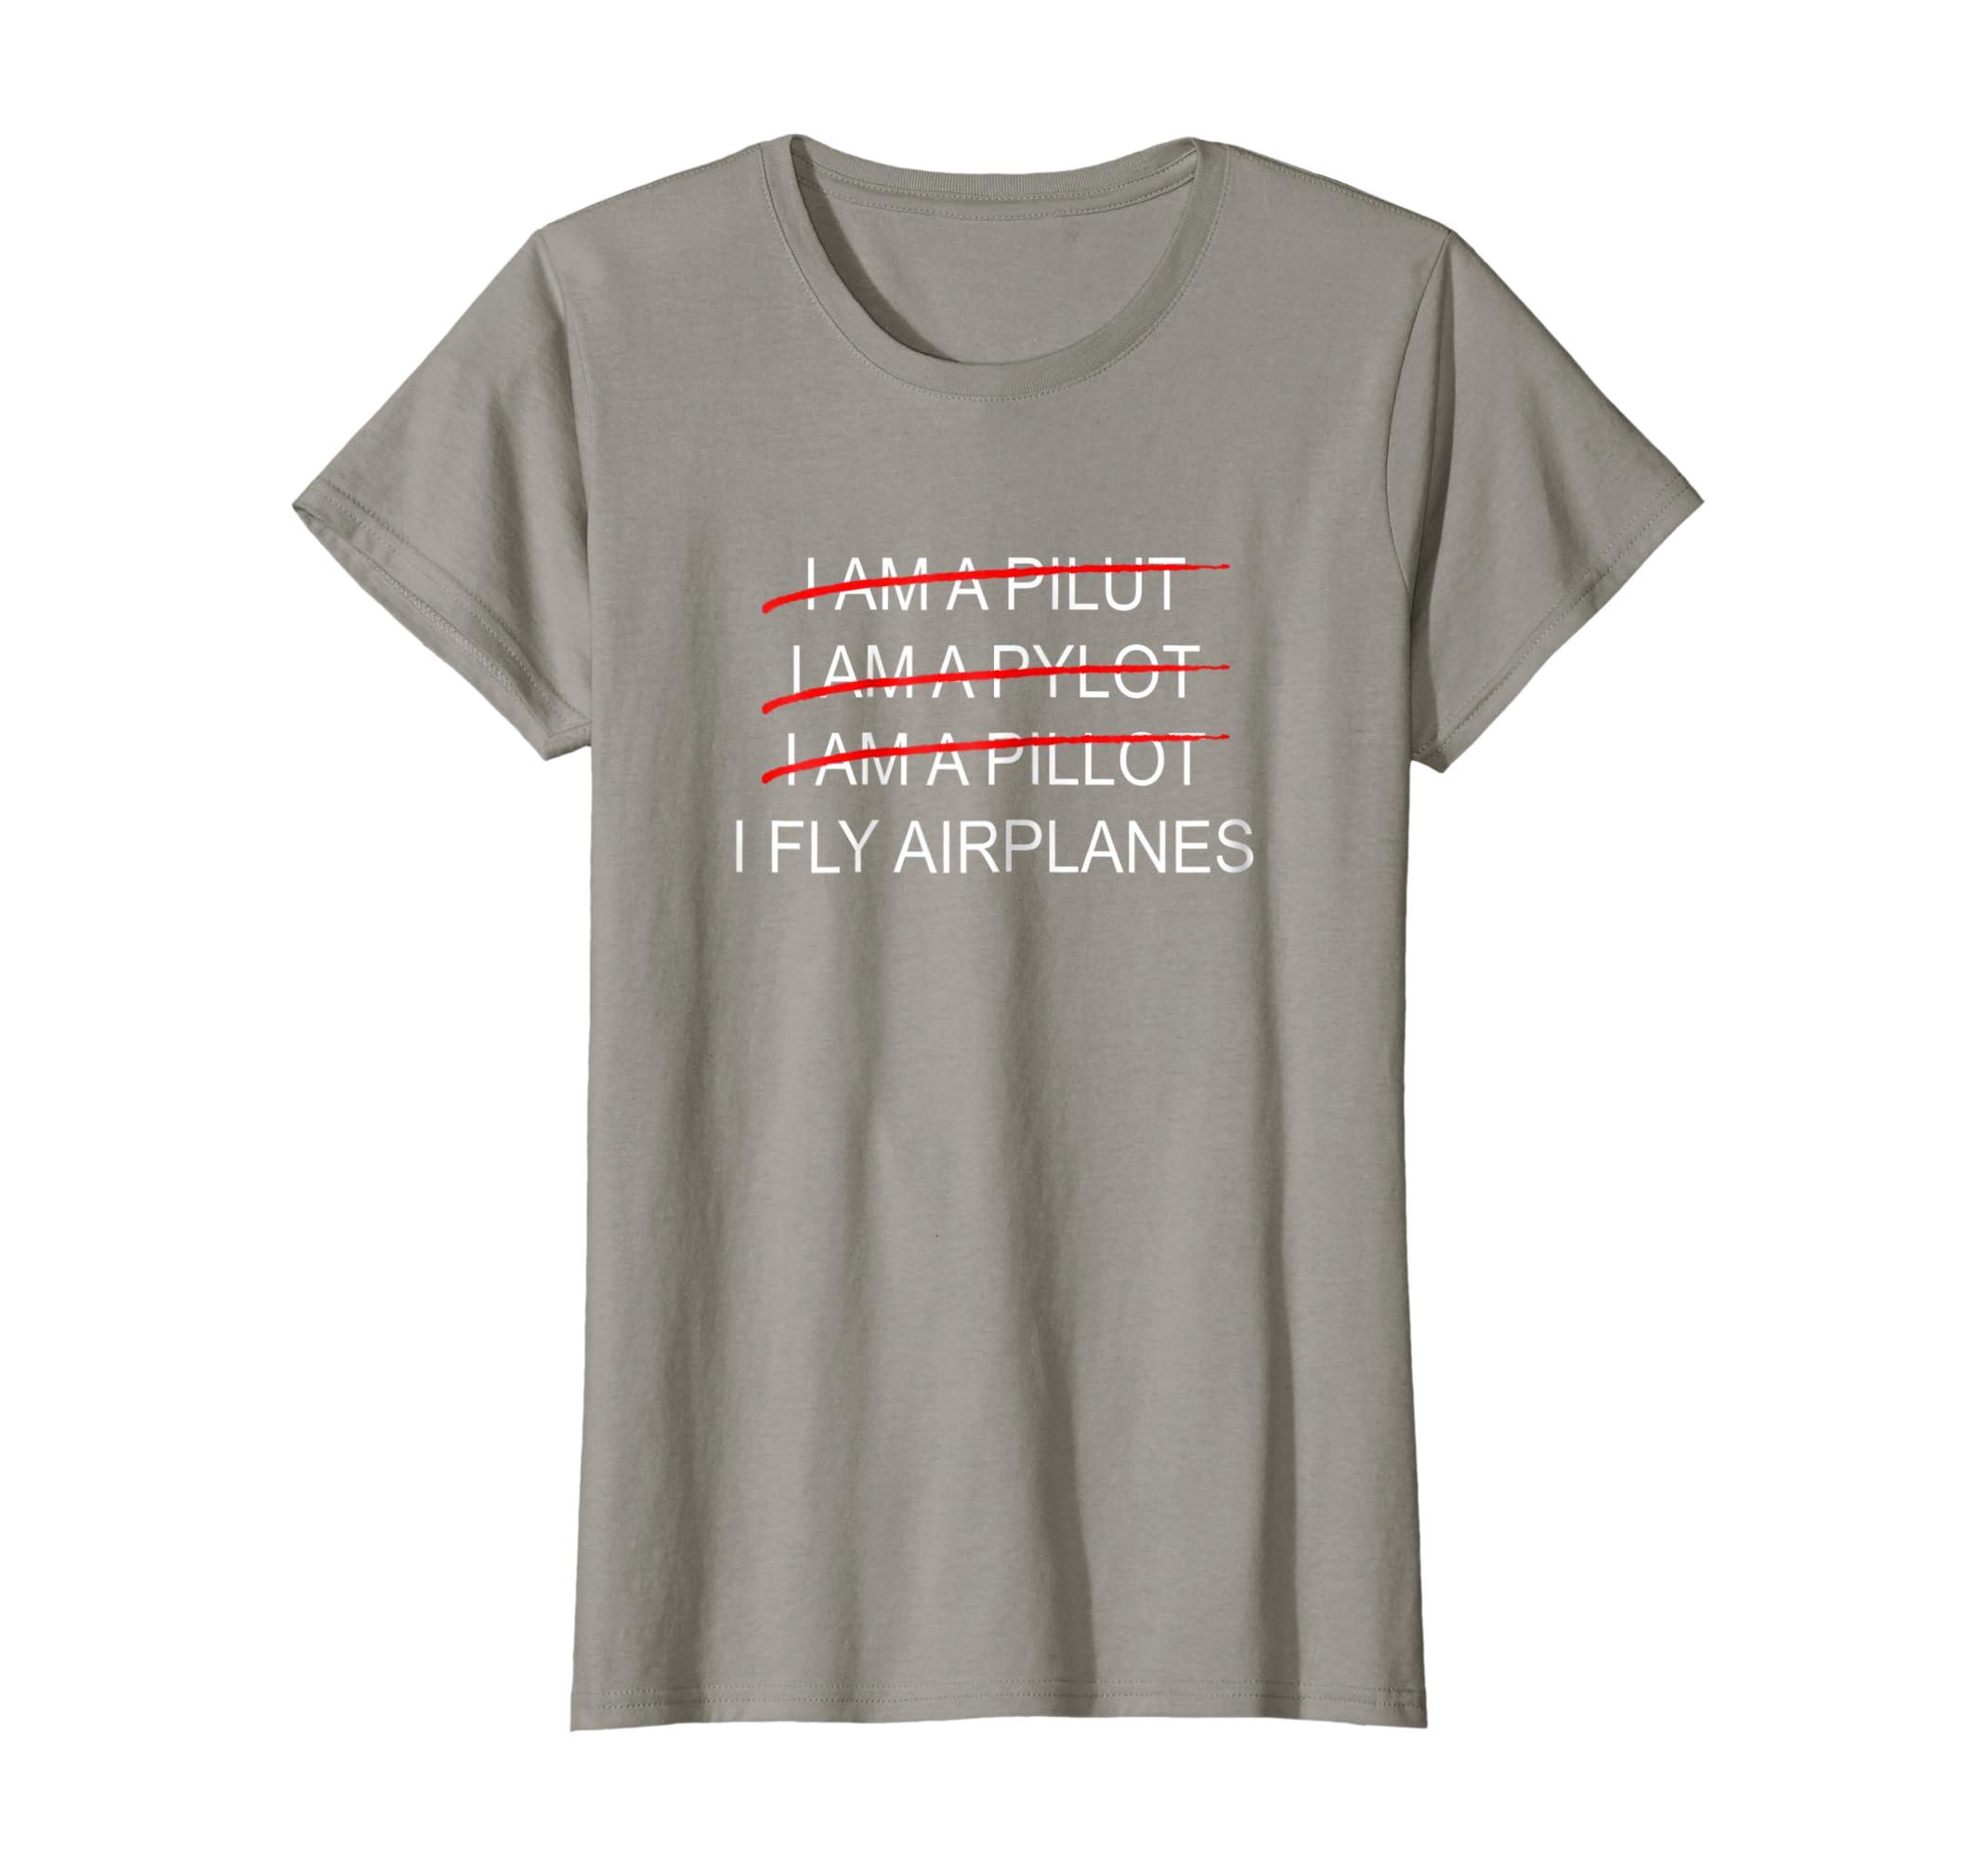 340e467c Amazon.com: Funny Aviation T Shirt I Fly Airplanes: Clothing